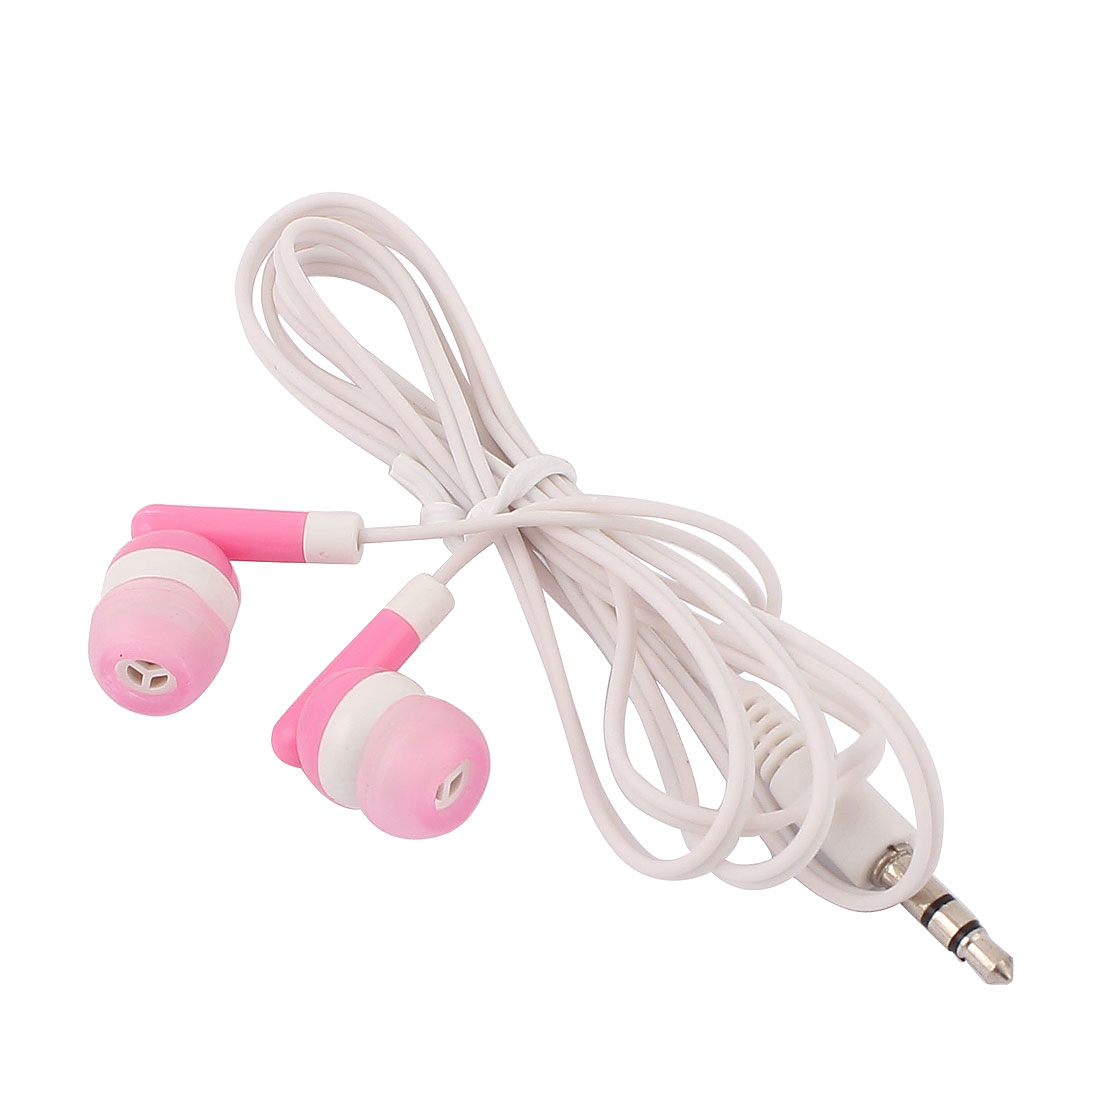 Smartphone Stereo Remote Mic In-Ear Headset Headphone Earbud Earphone Pink